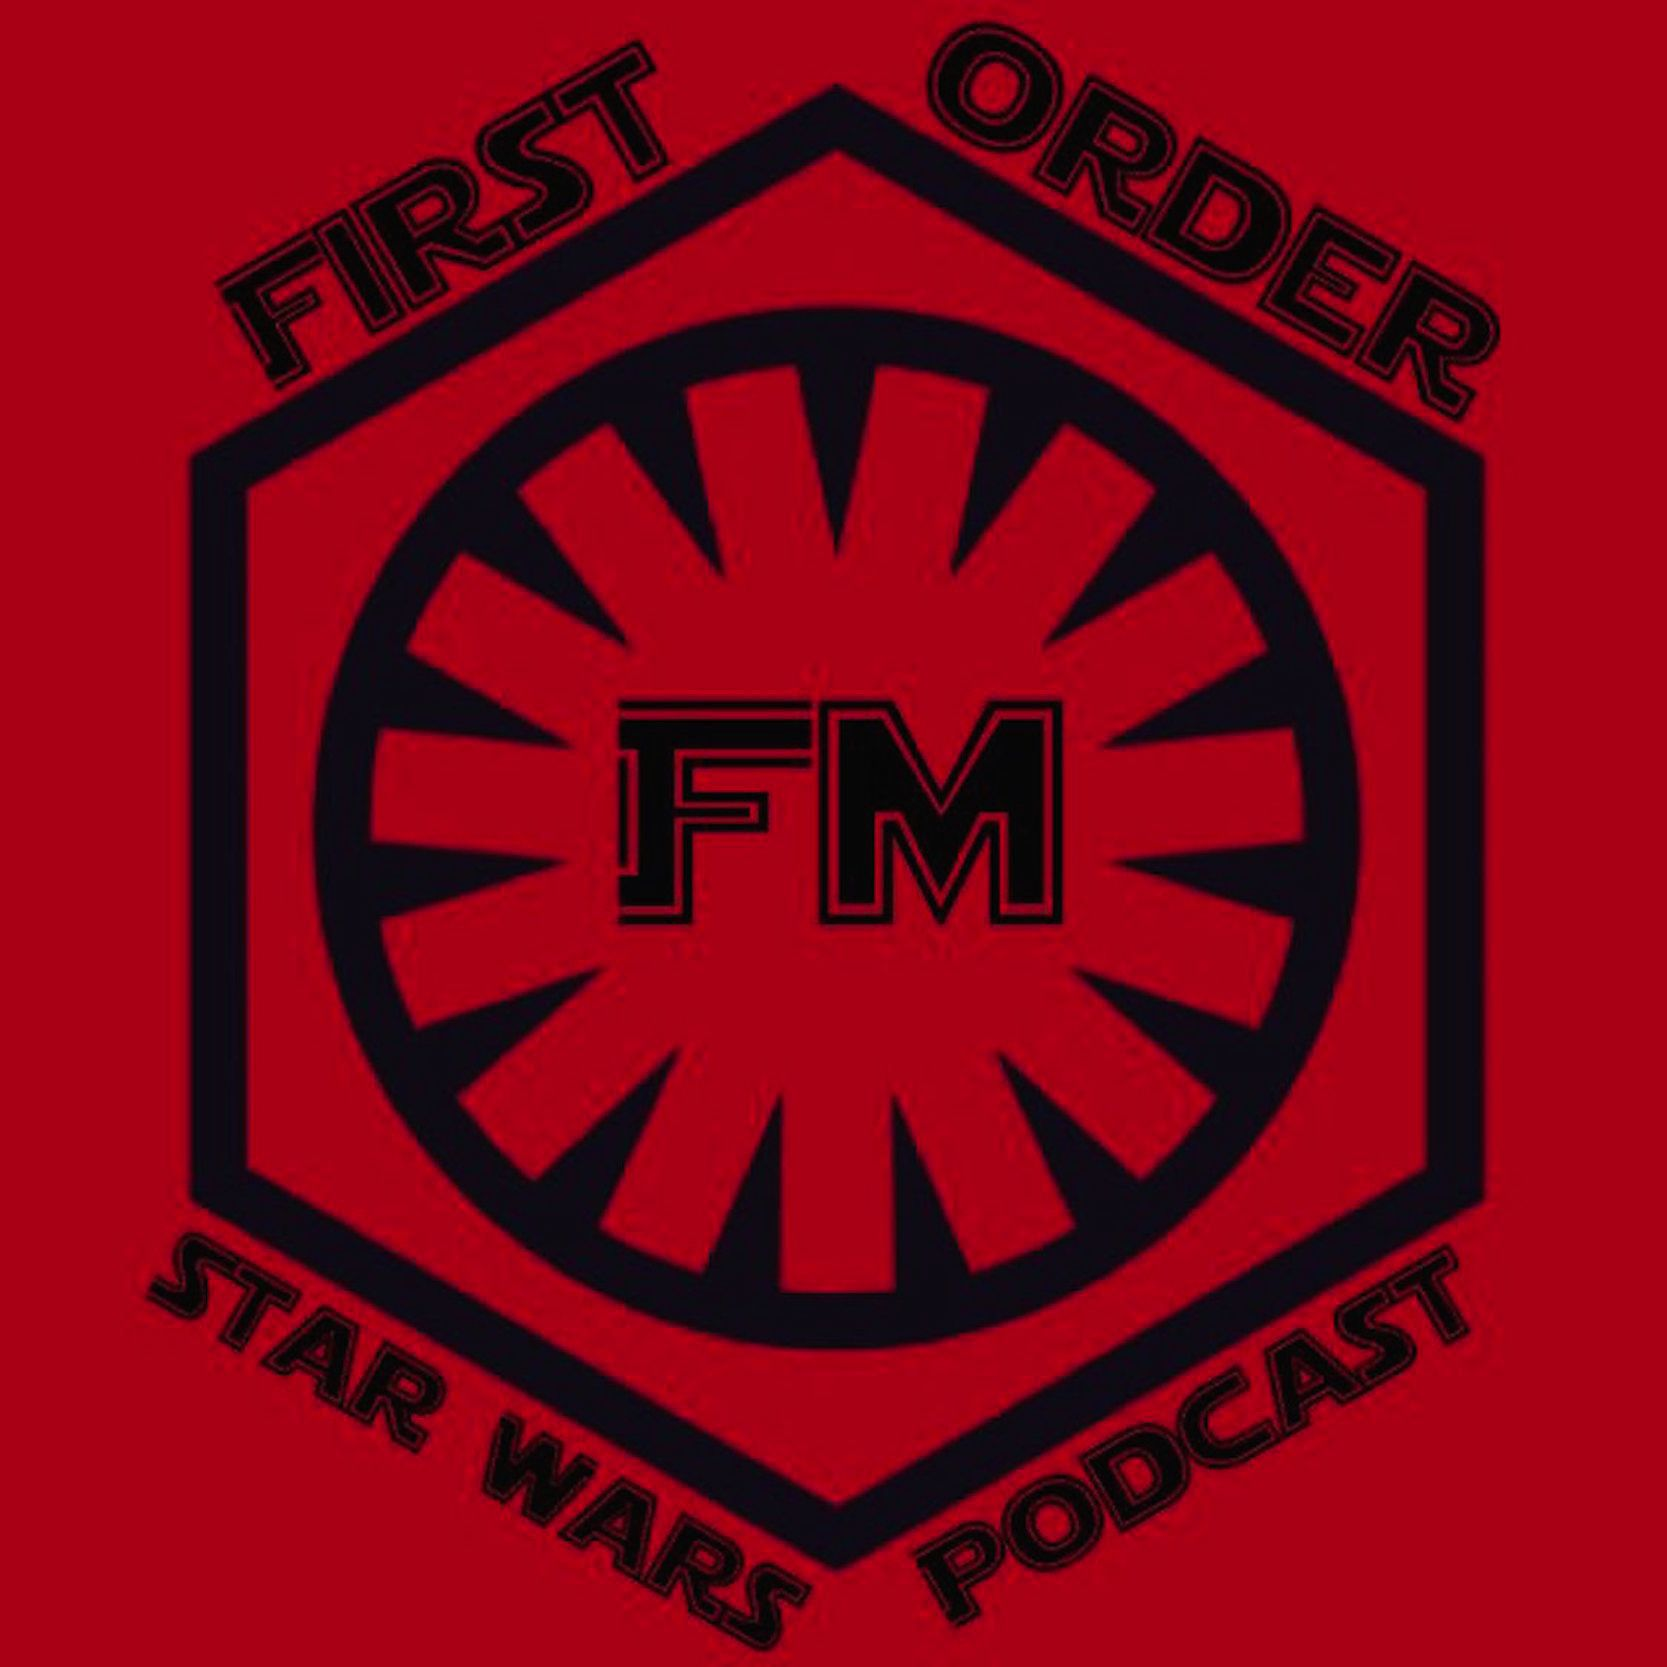 First Order FM